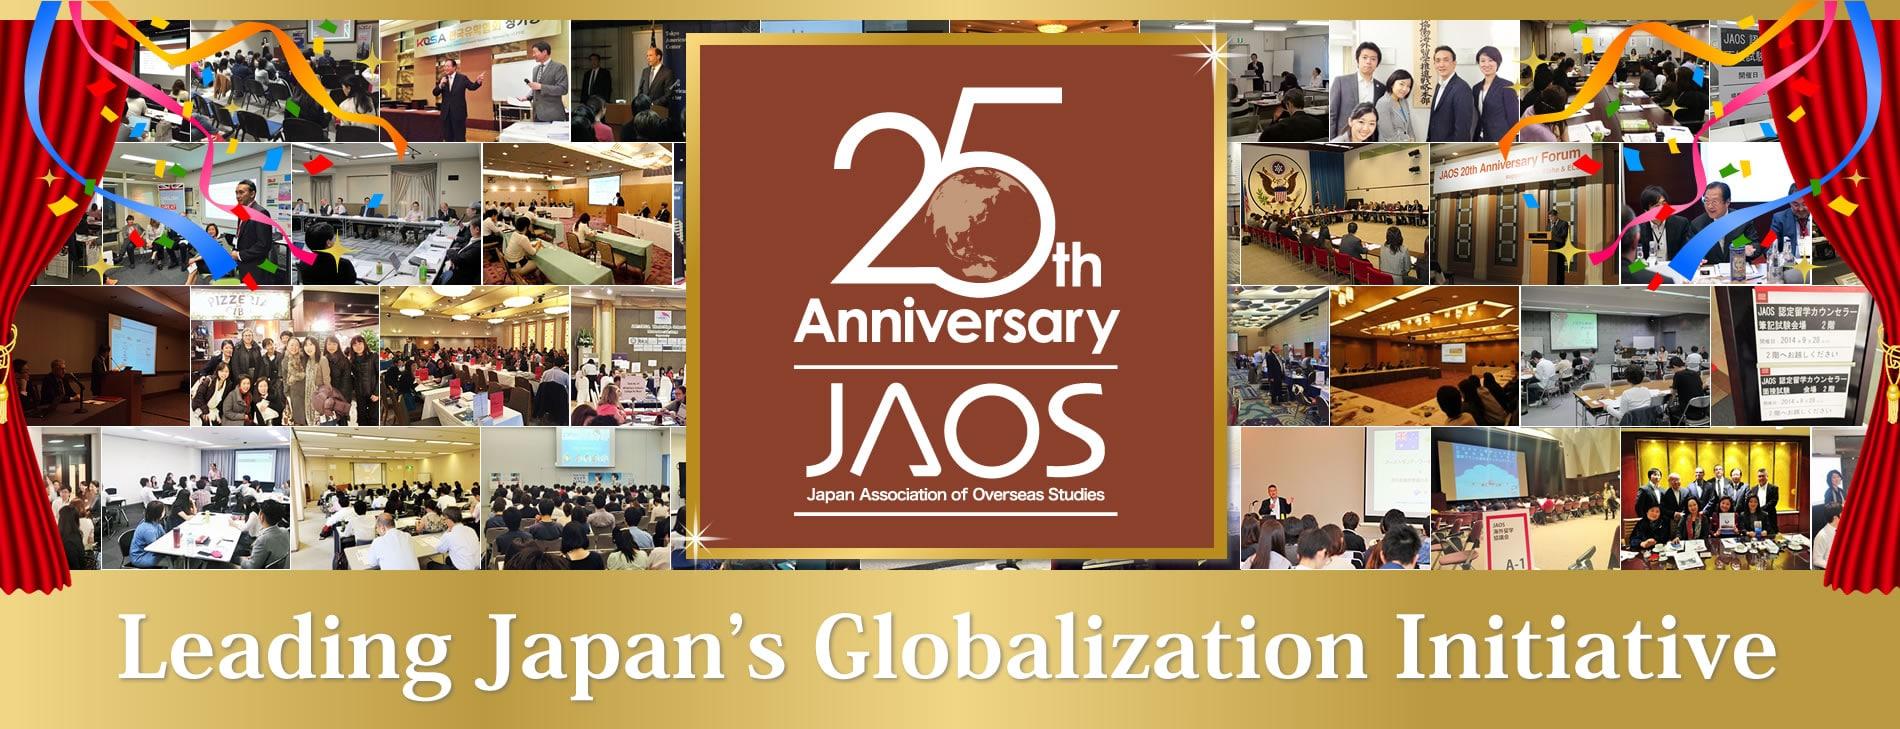 JAOS25th Anniversary